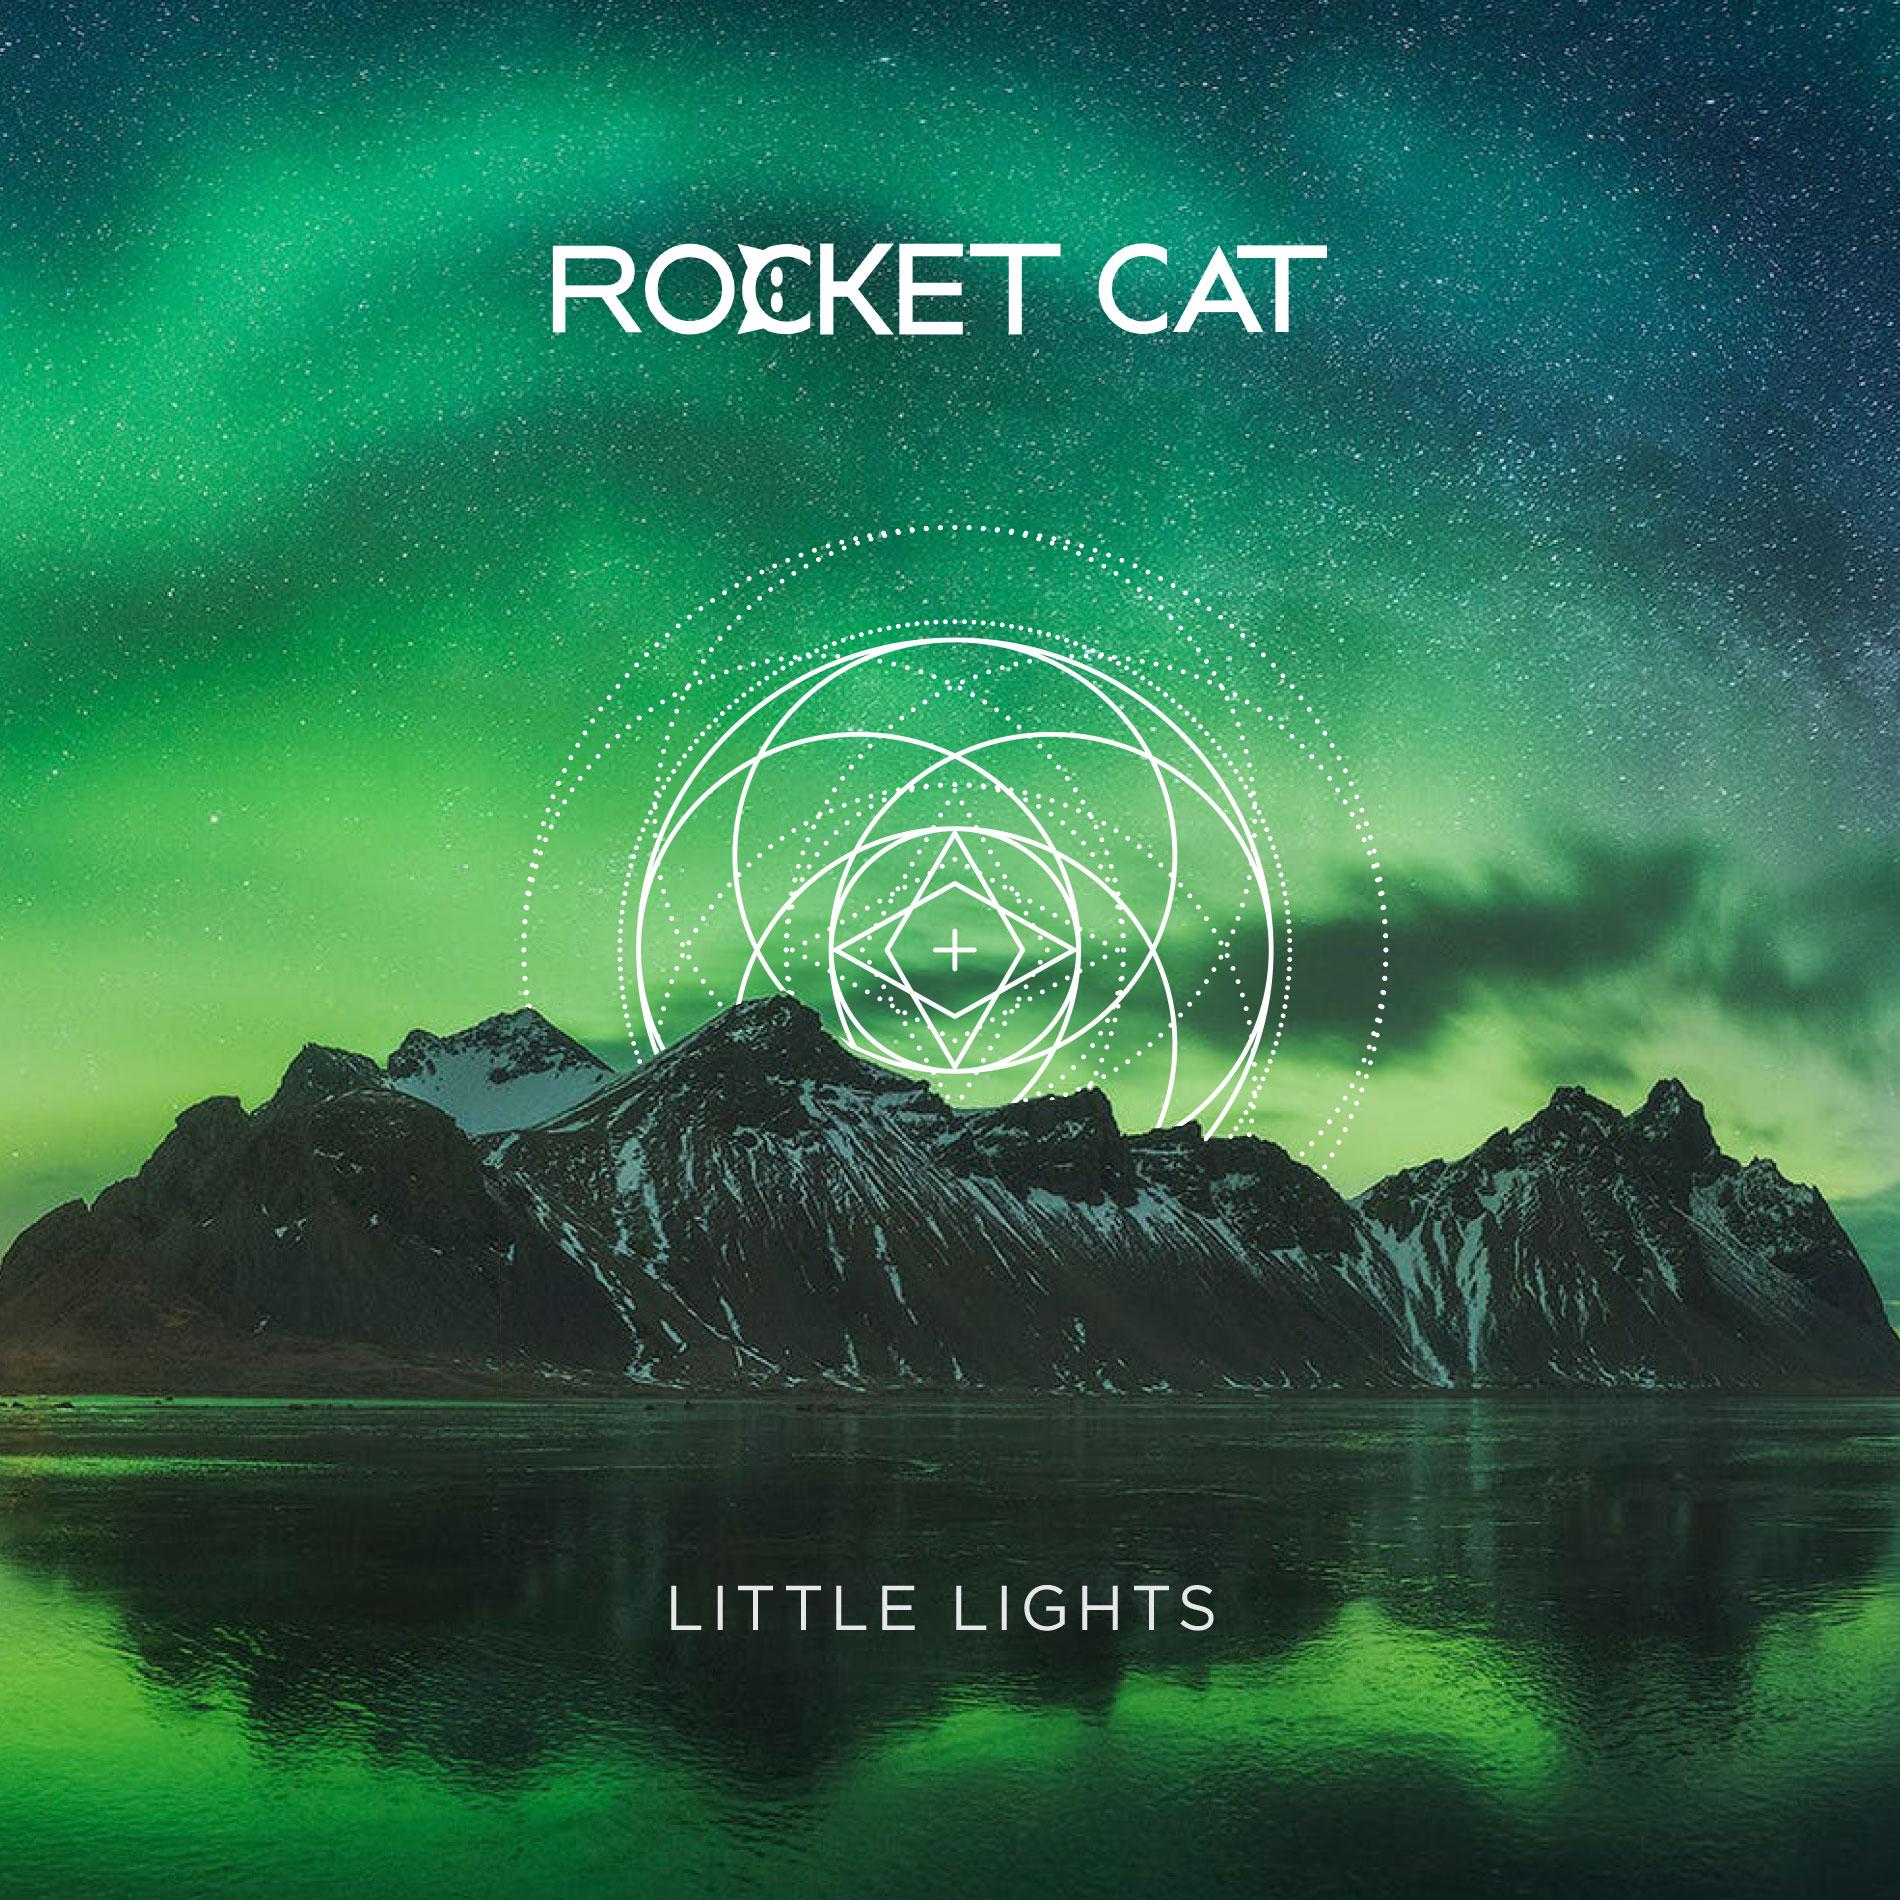 rocket cat little lights cover